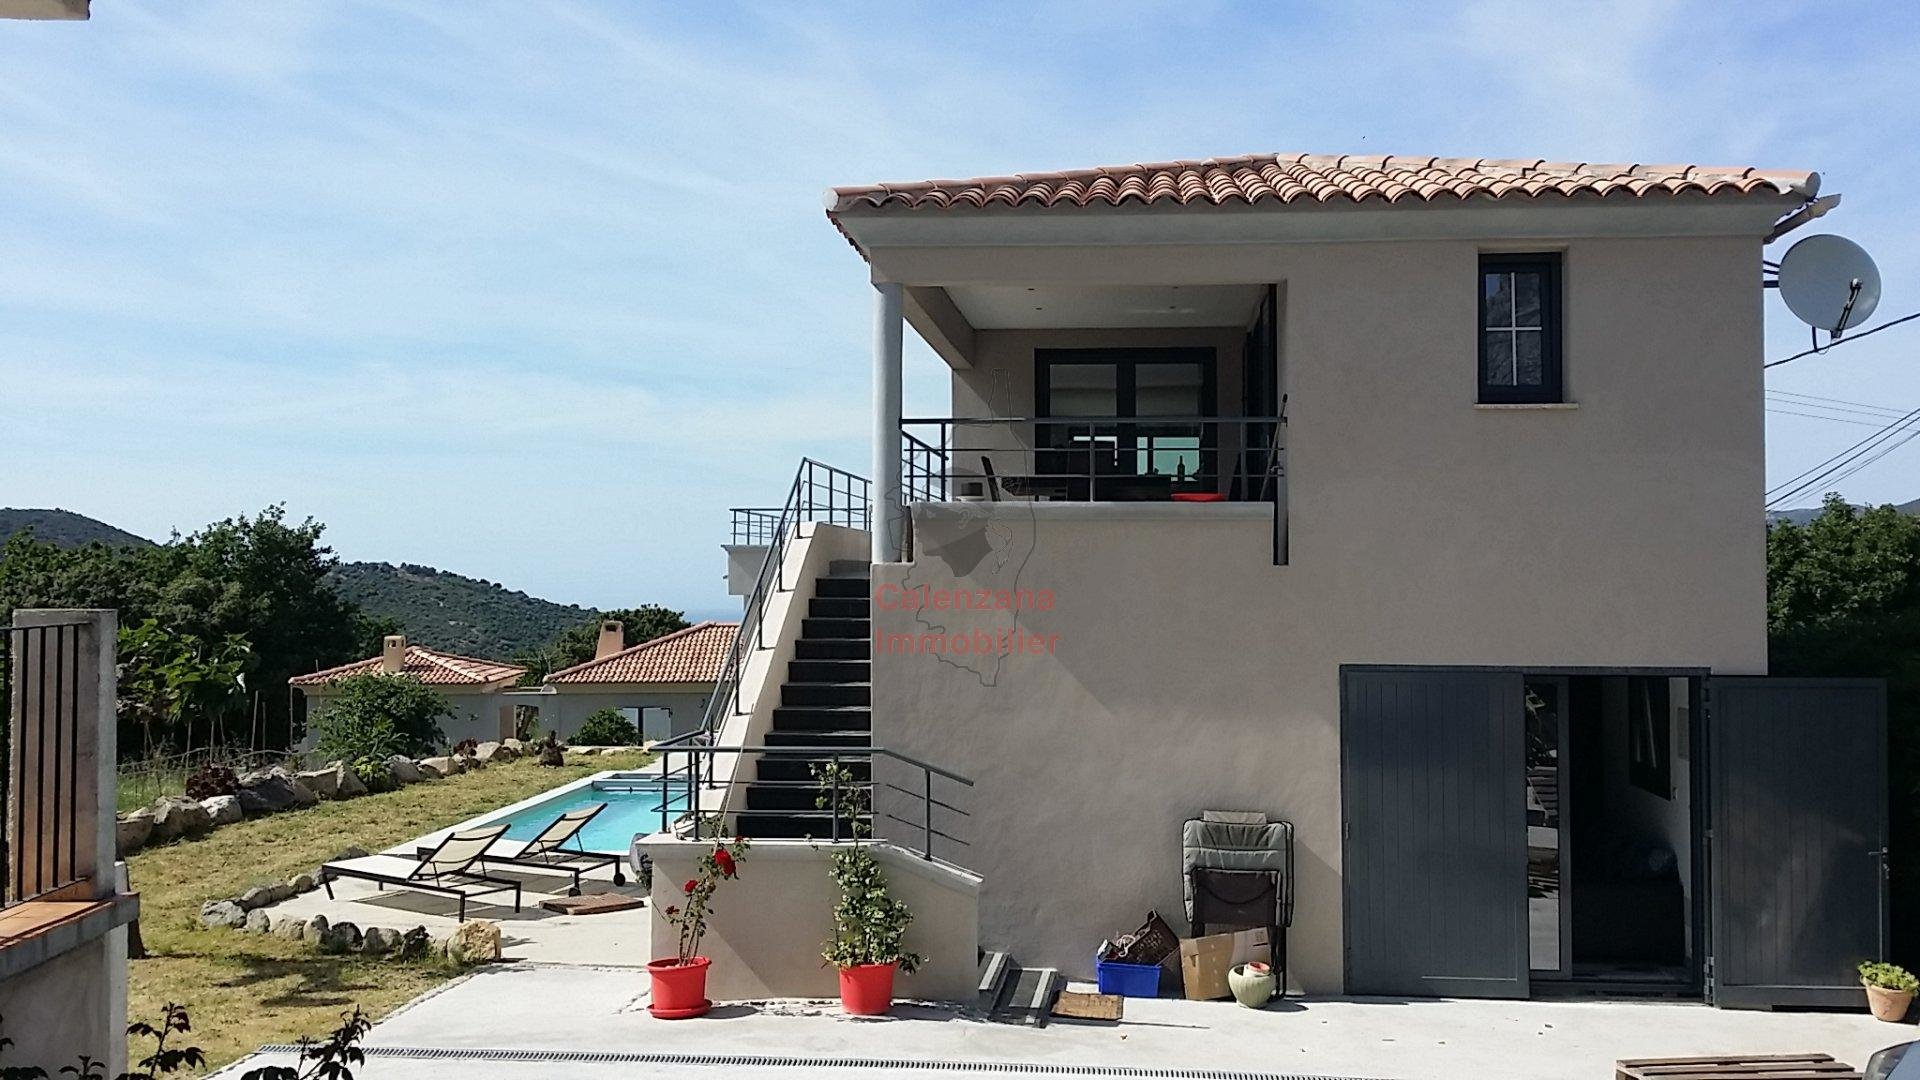 CALENZANA | VILLA AVEC PISCINE - T4 | 180 m2